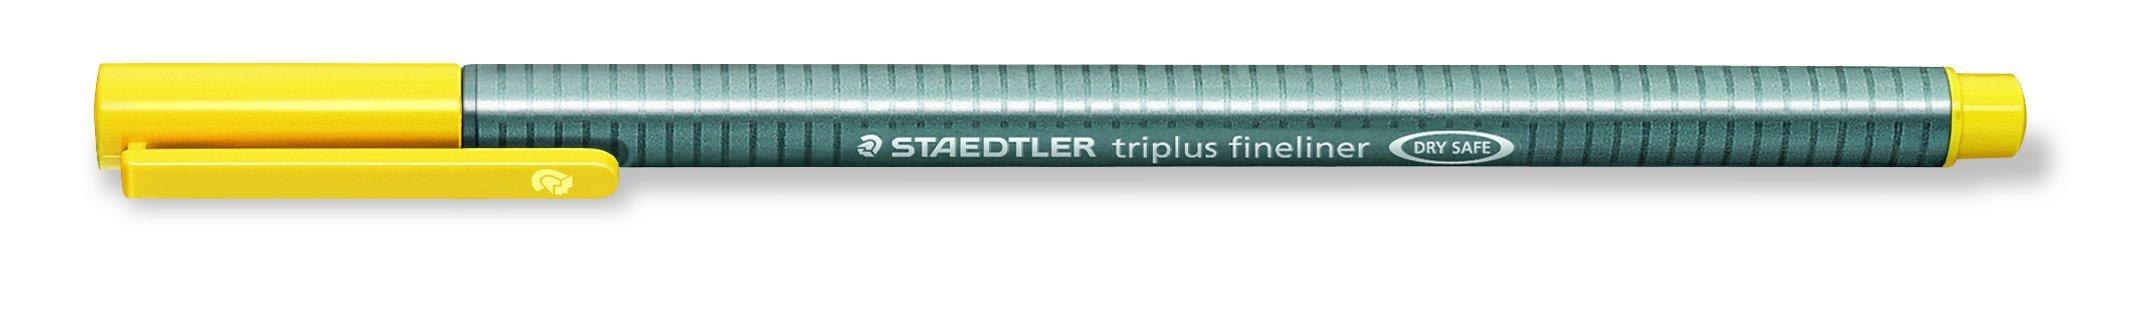 Triplus Fineliner ''26-Piece Bonus Pack'' Pens by Staedtler, 0.3mm, Metal Clad Tip, 26/PK (20 + 6 Neon Colors), Assorted (1-Pack) by STAEDTLER (Image #3)